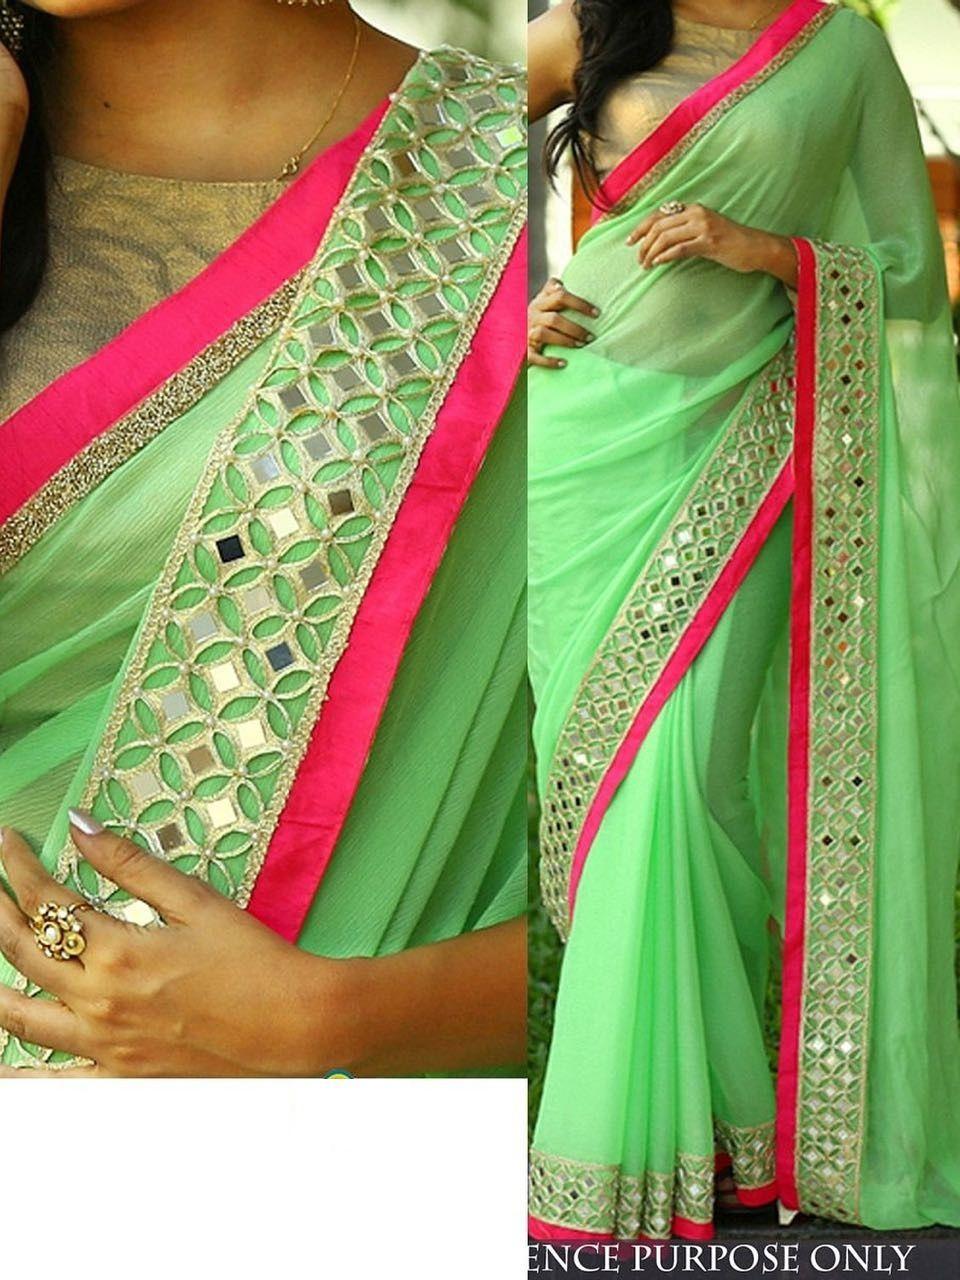 24c3a99bd6d9f7 Shop Pista green color Nylon georgette designer party wear saree online at…